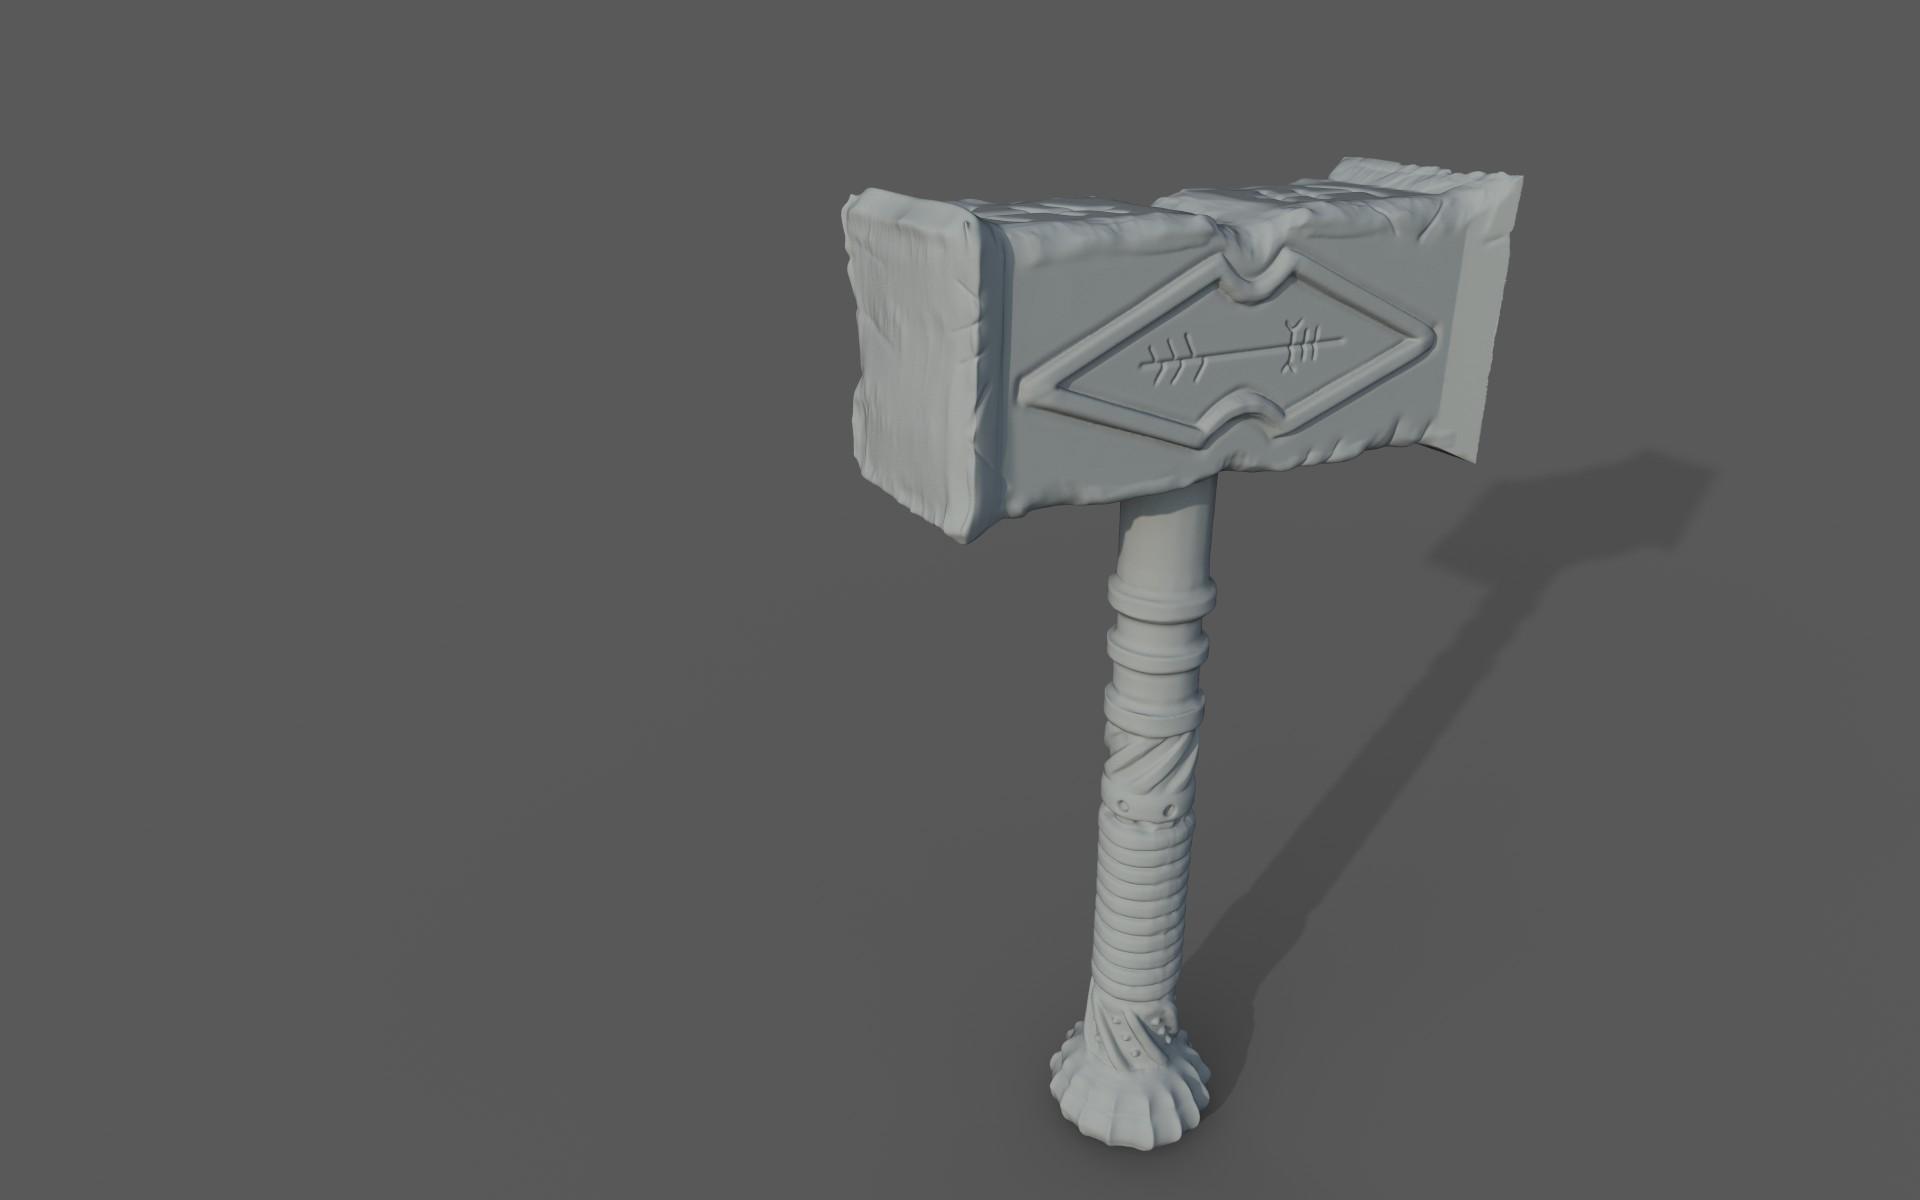 Matej chalachan hammer sculpt2